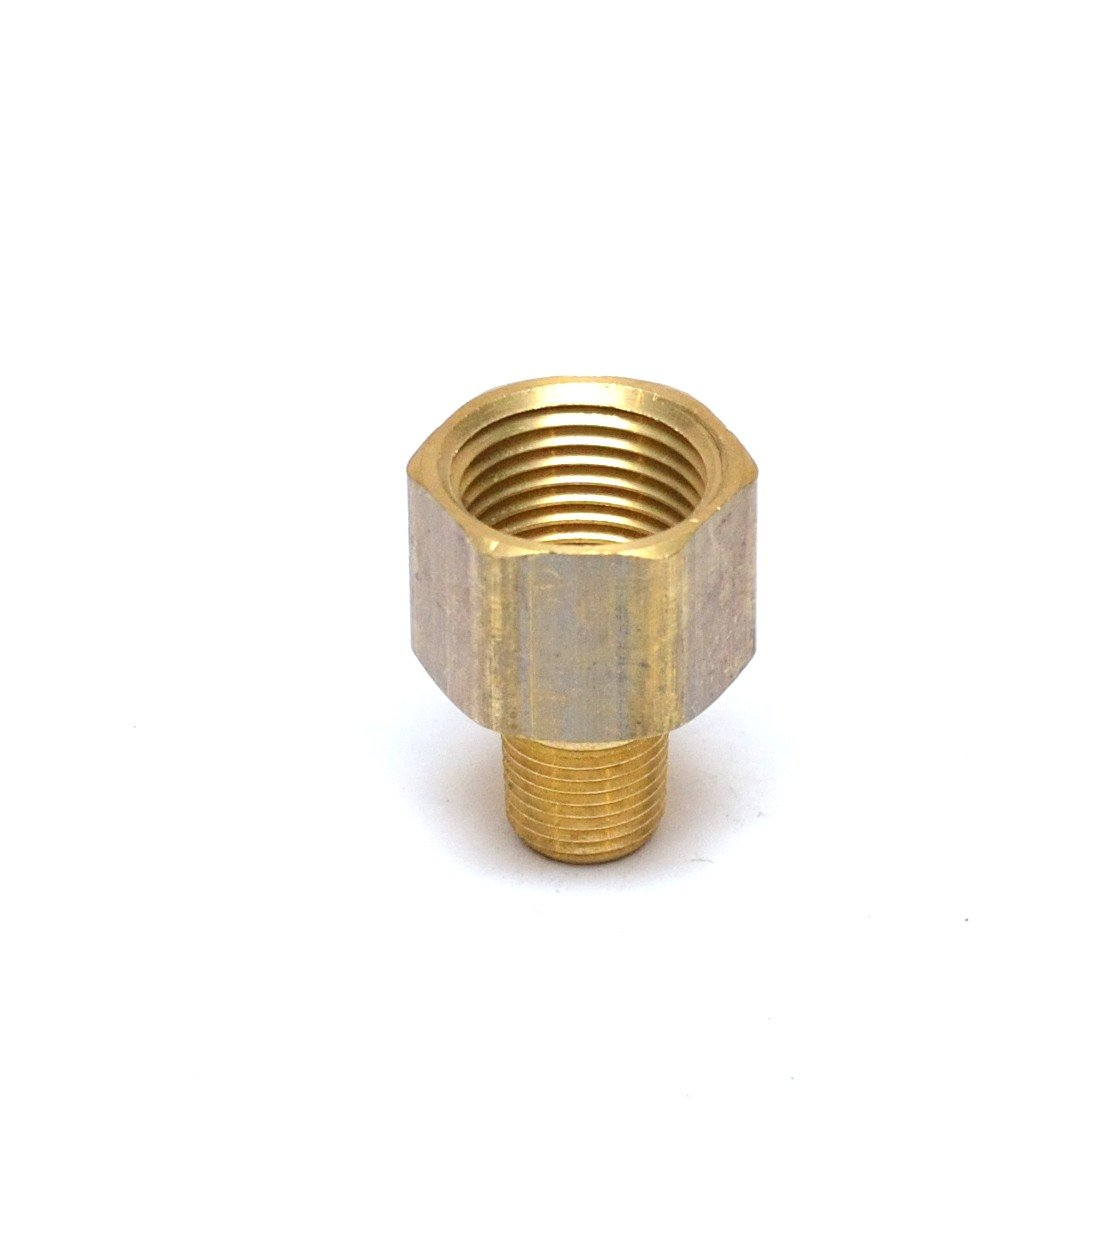 Acero Inoxidable para Agua Aceite Medidor de Presi/ón de Aire sourcing map Reducing Pipe Fitting Adapter 1//4 ZG Macho x 3//8 G Hembra